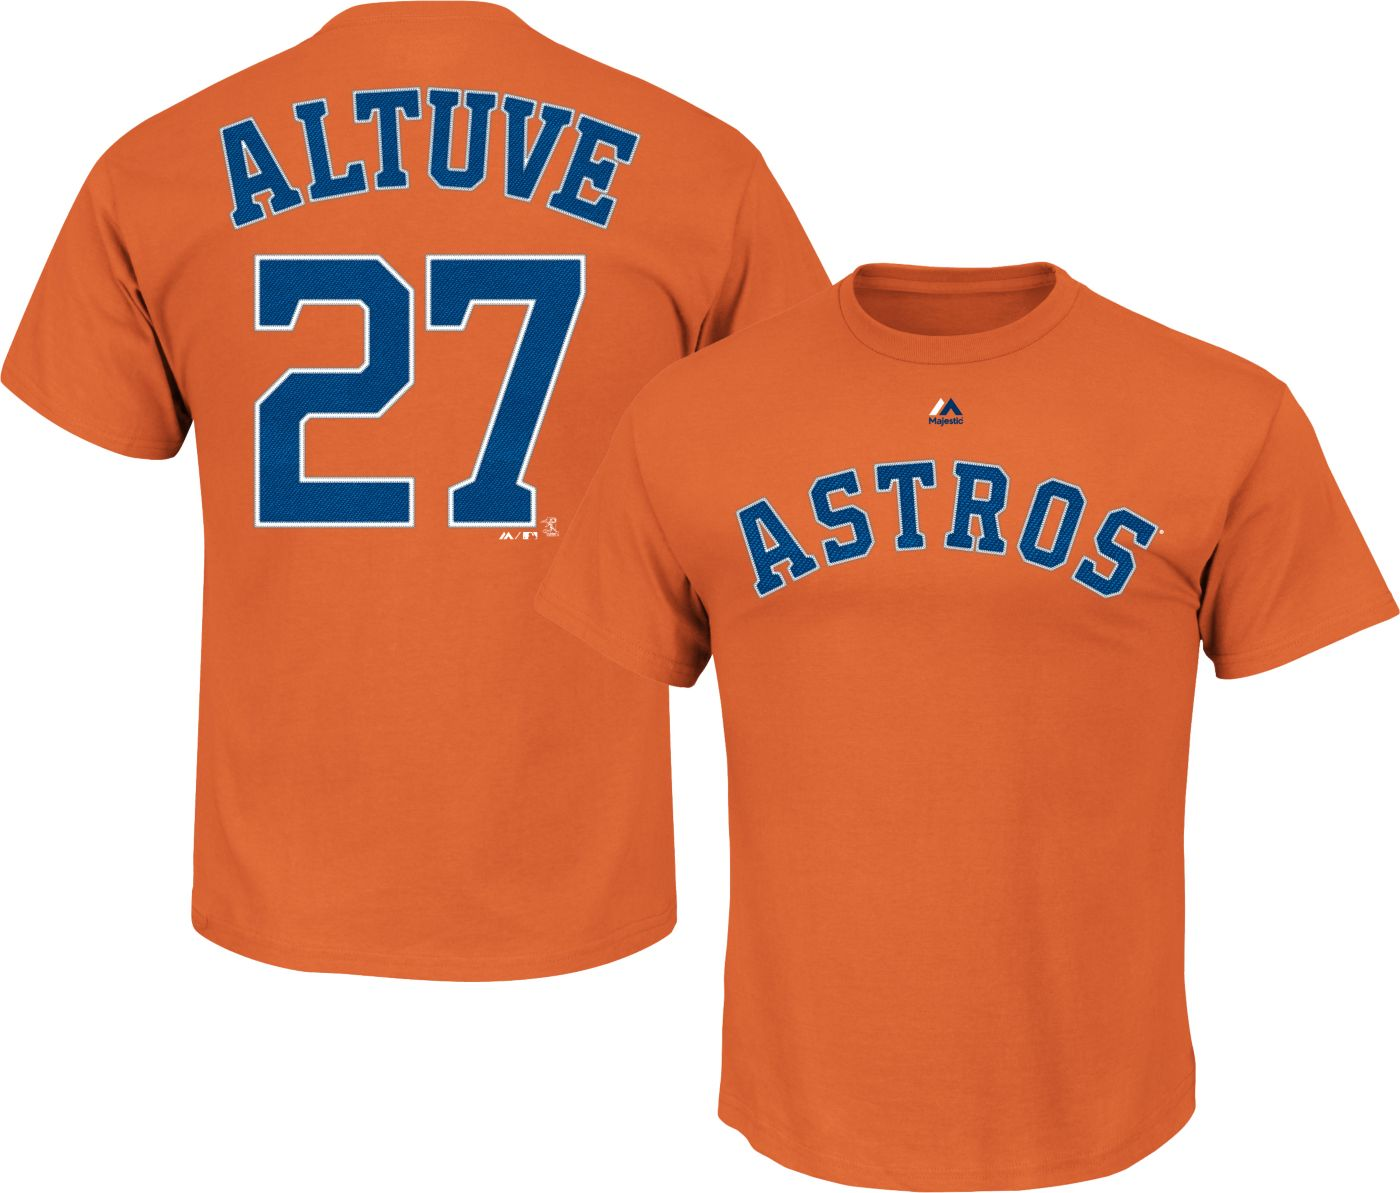 Majestic Youth Houston Astros Jose Altuve #27 Orange T-Shirt